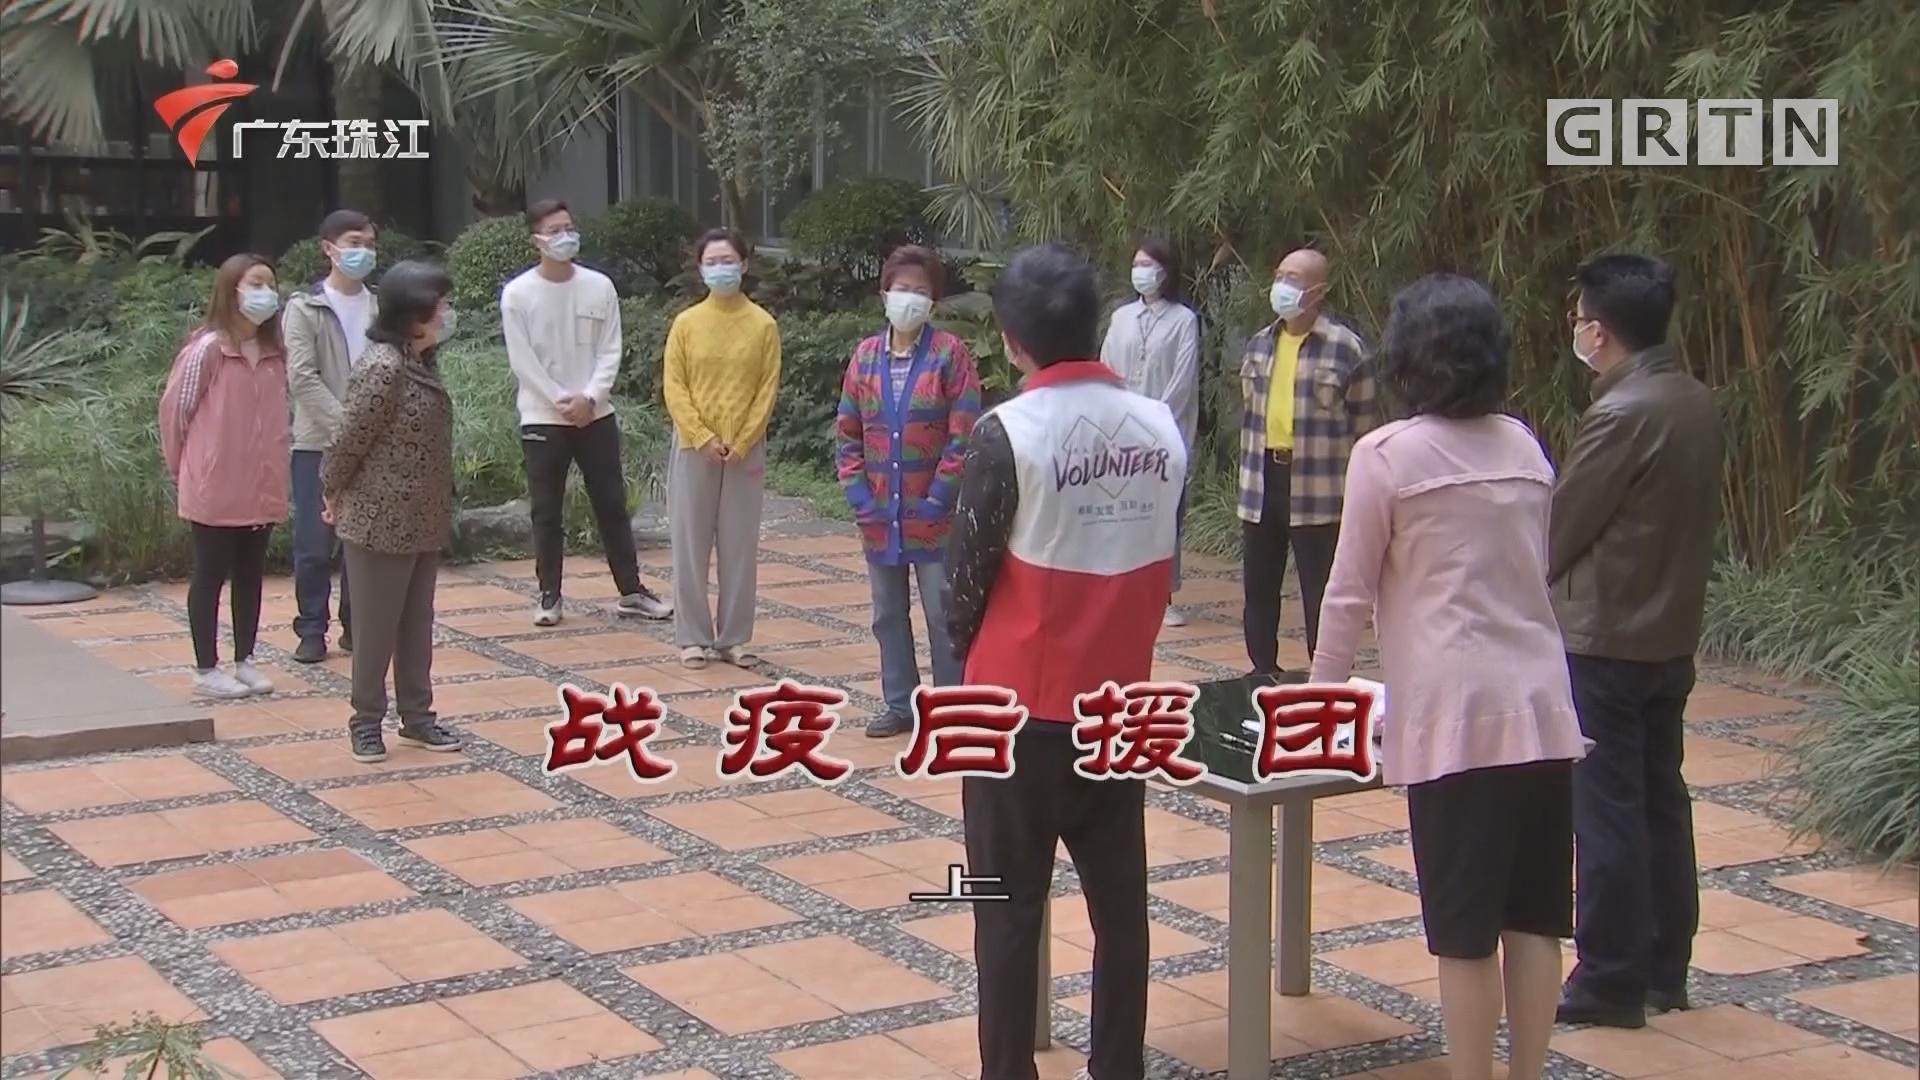 [HD][2020-06-06]外来媳妇本地郎:战疫后援团(上)